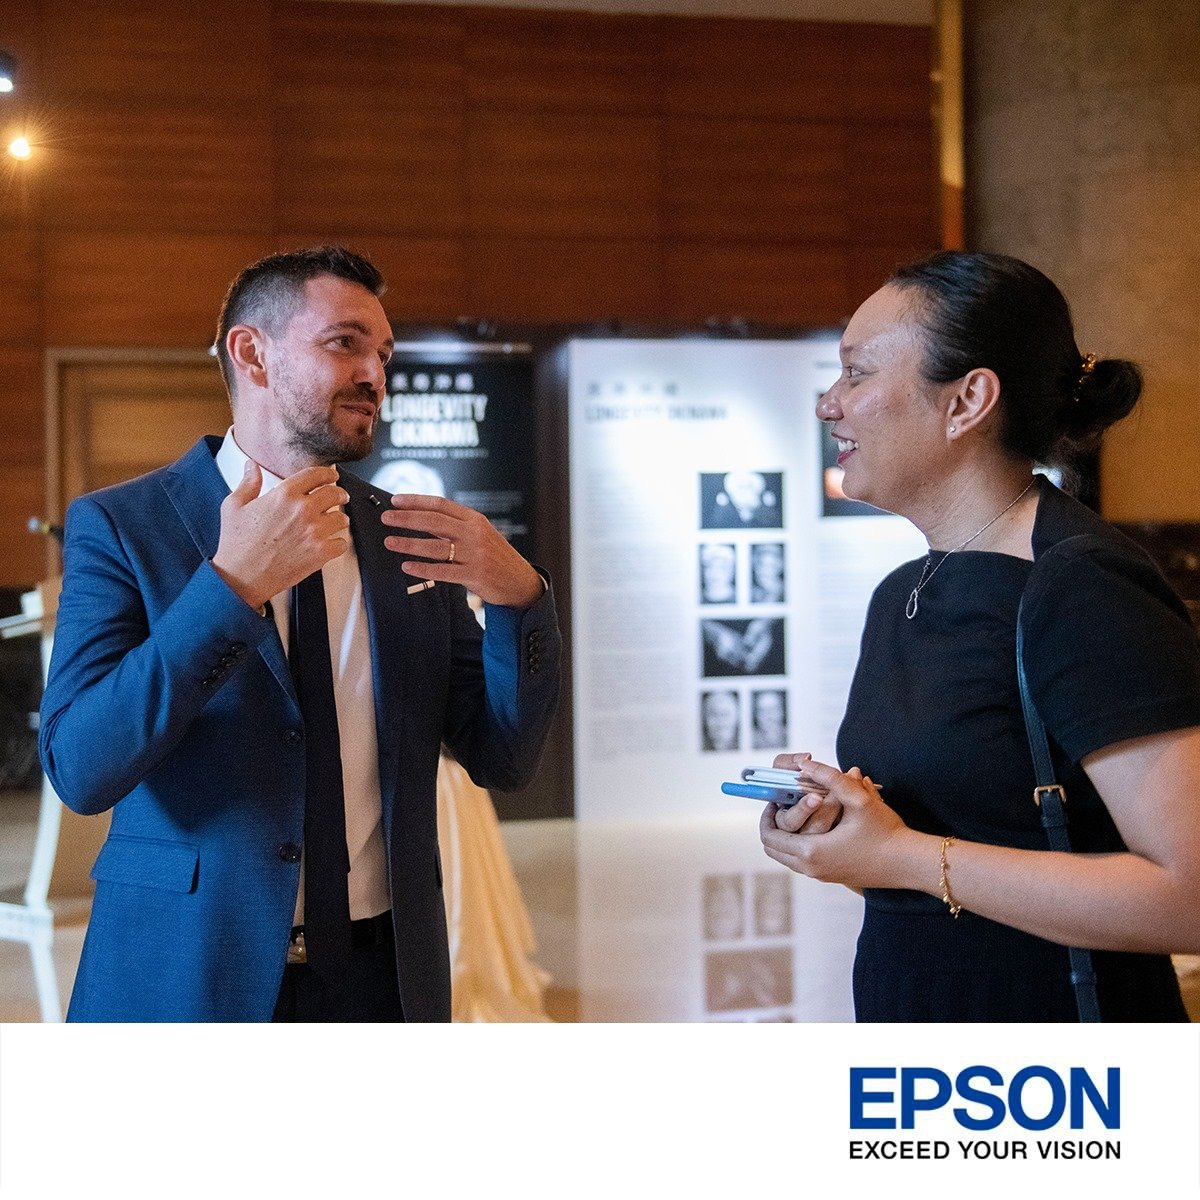 Epson printer photography exhibition singapore Jose Jeuland photographer talk pixerf